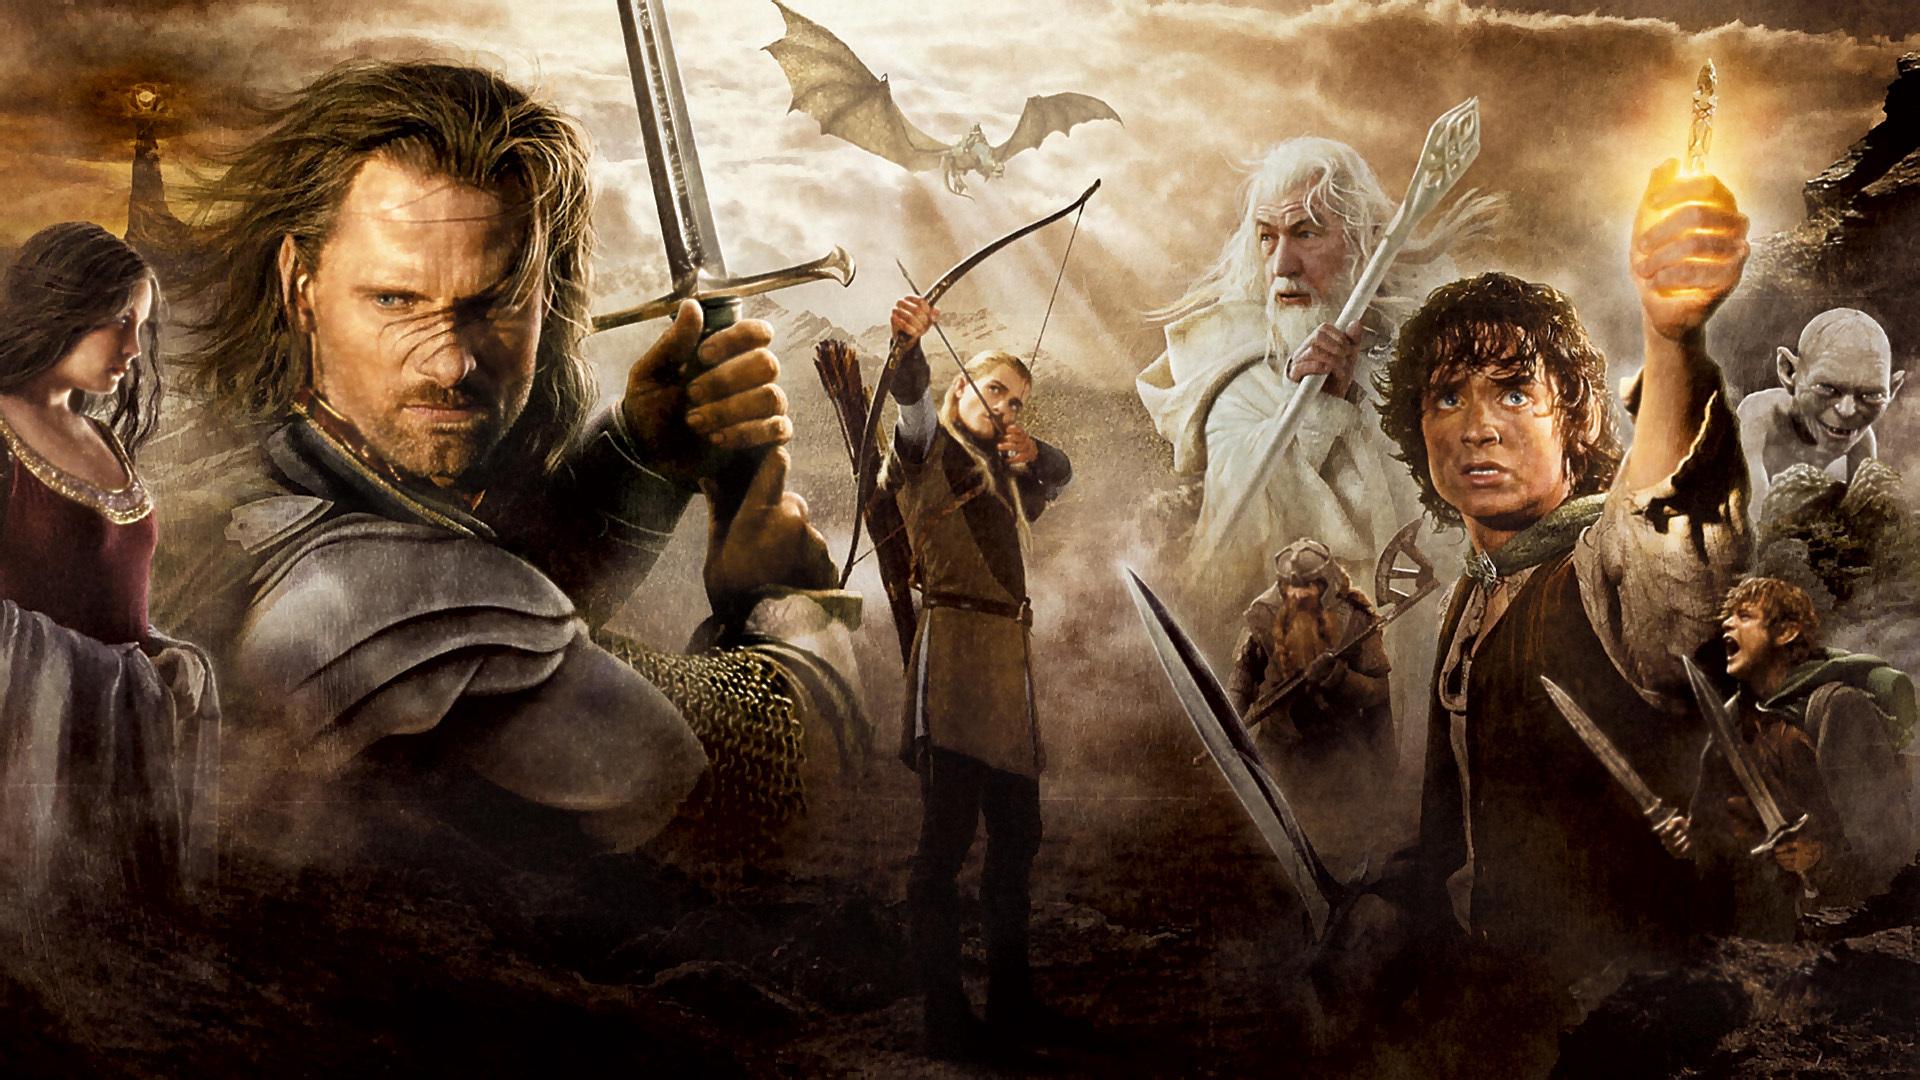 Lord Of The Rings HD Wall by Paul Emmeth on FeelGrafix 1920x1080